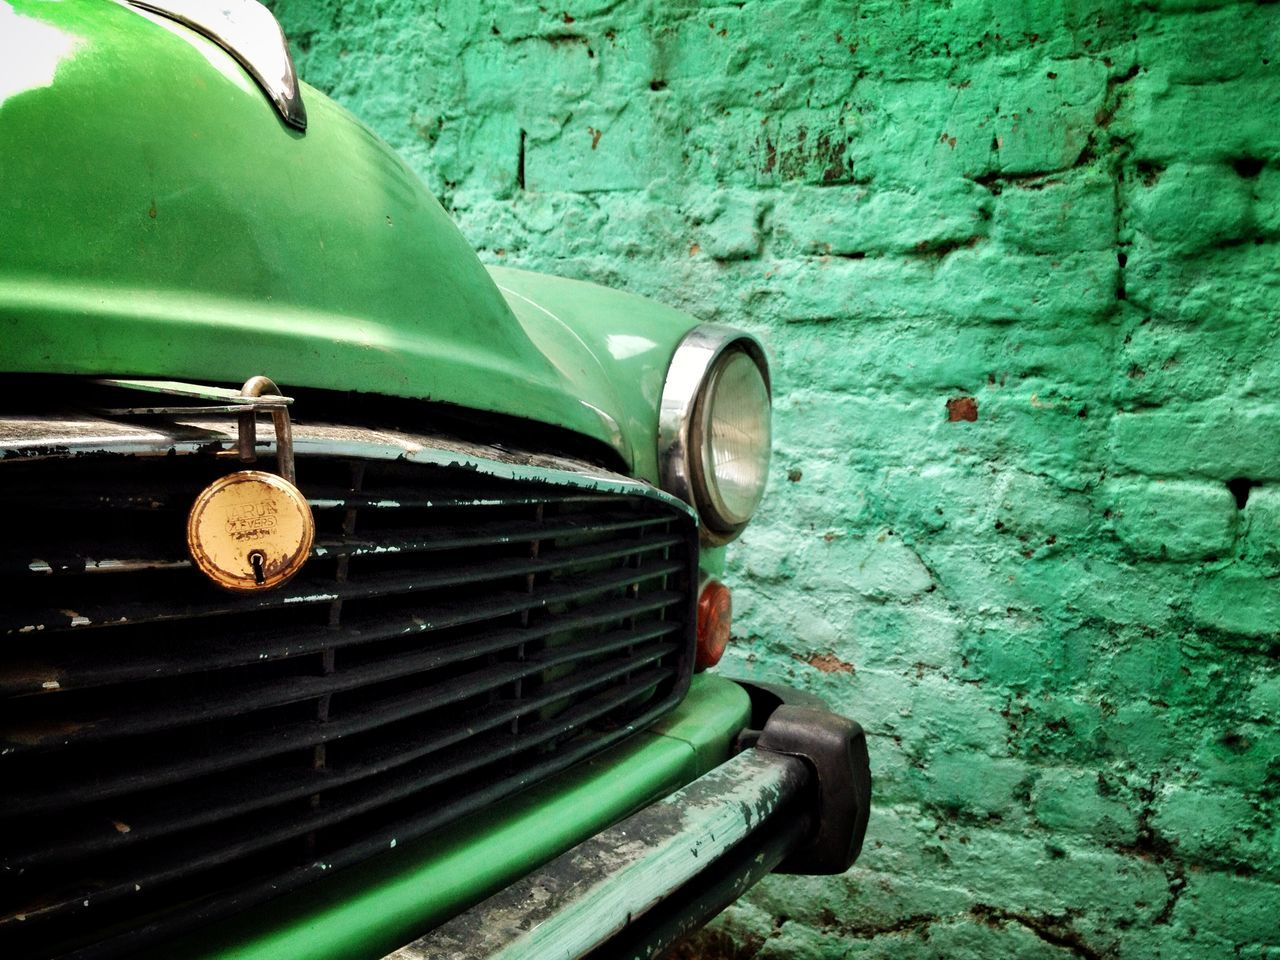 Kolkata India Car Travel Traveling Iphonography Streetphotography Locker